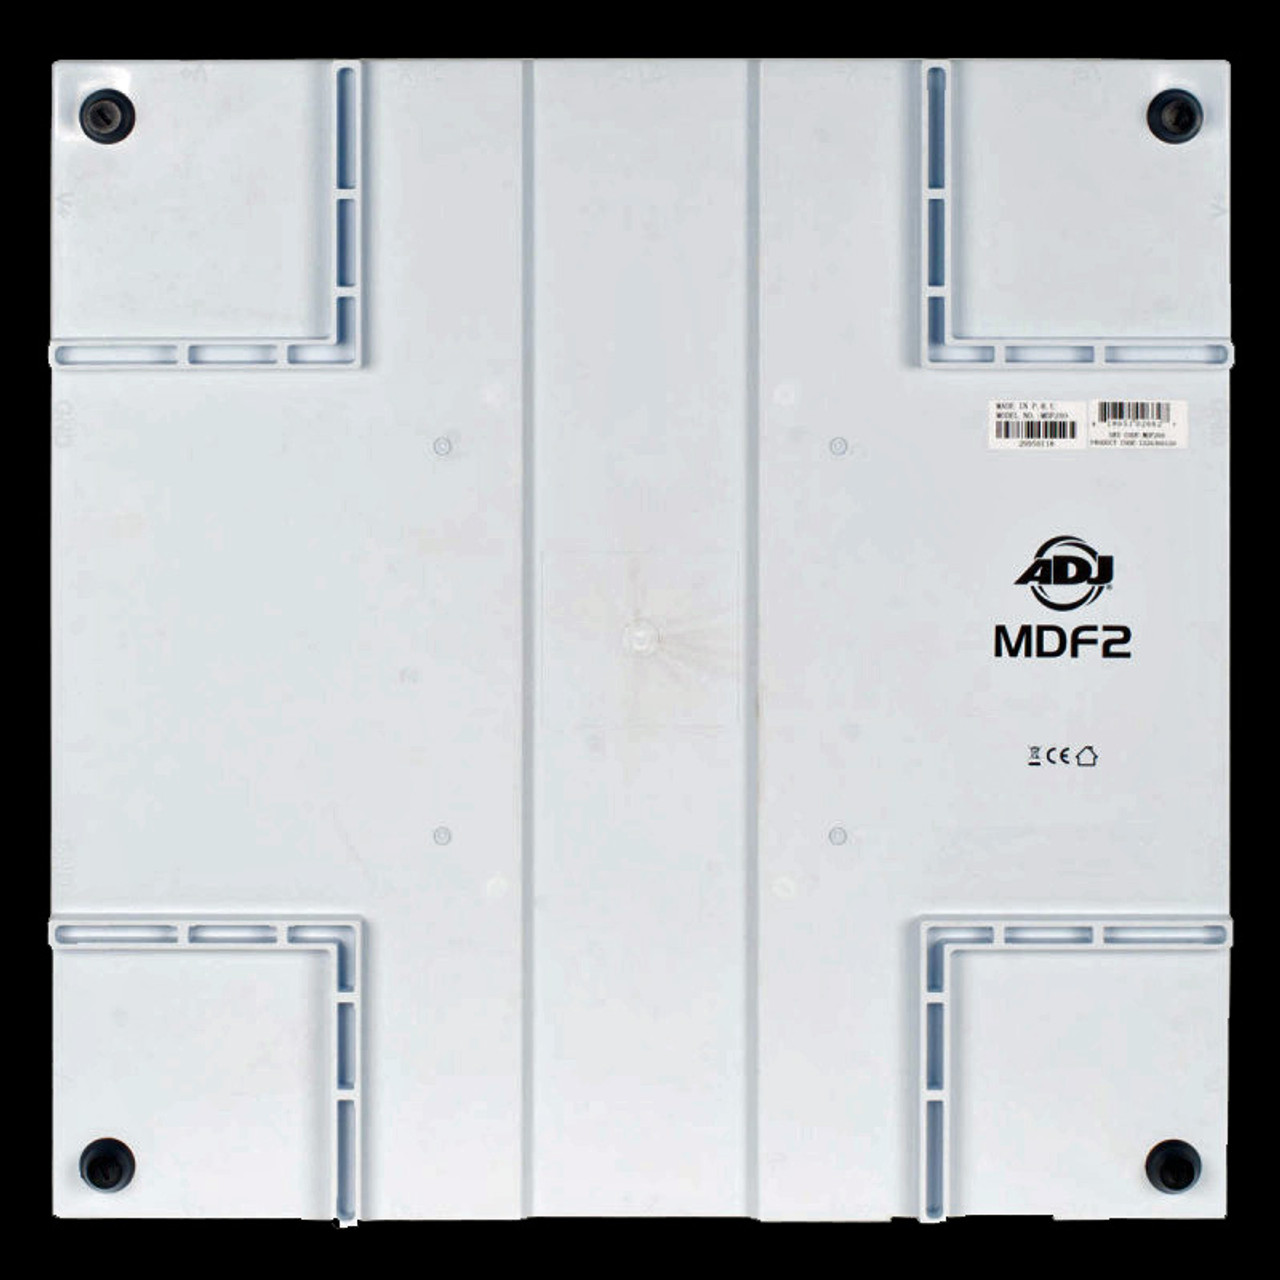 ADJ Single Magnetic LED Dance Floor Square / MDF2